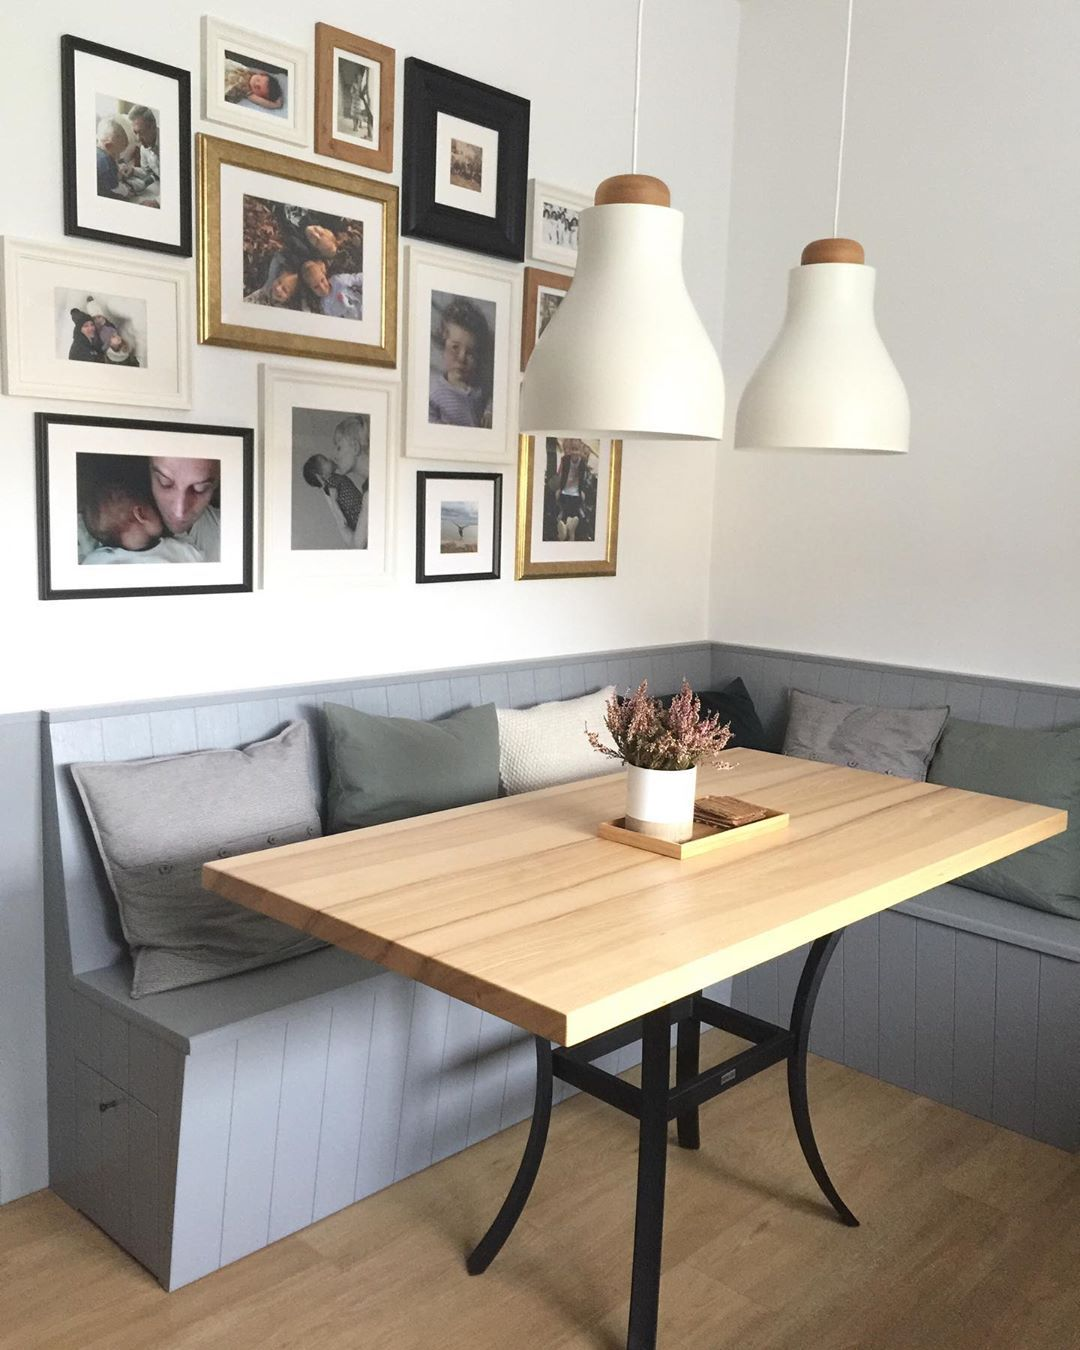 17 Best Kitchen Corner Bench Seating With Storage Ideas In 2020 Kitchen Corner Bench Seating Bench Seating Kitchen Dining Room Small